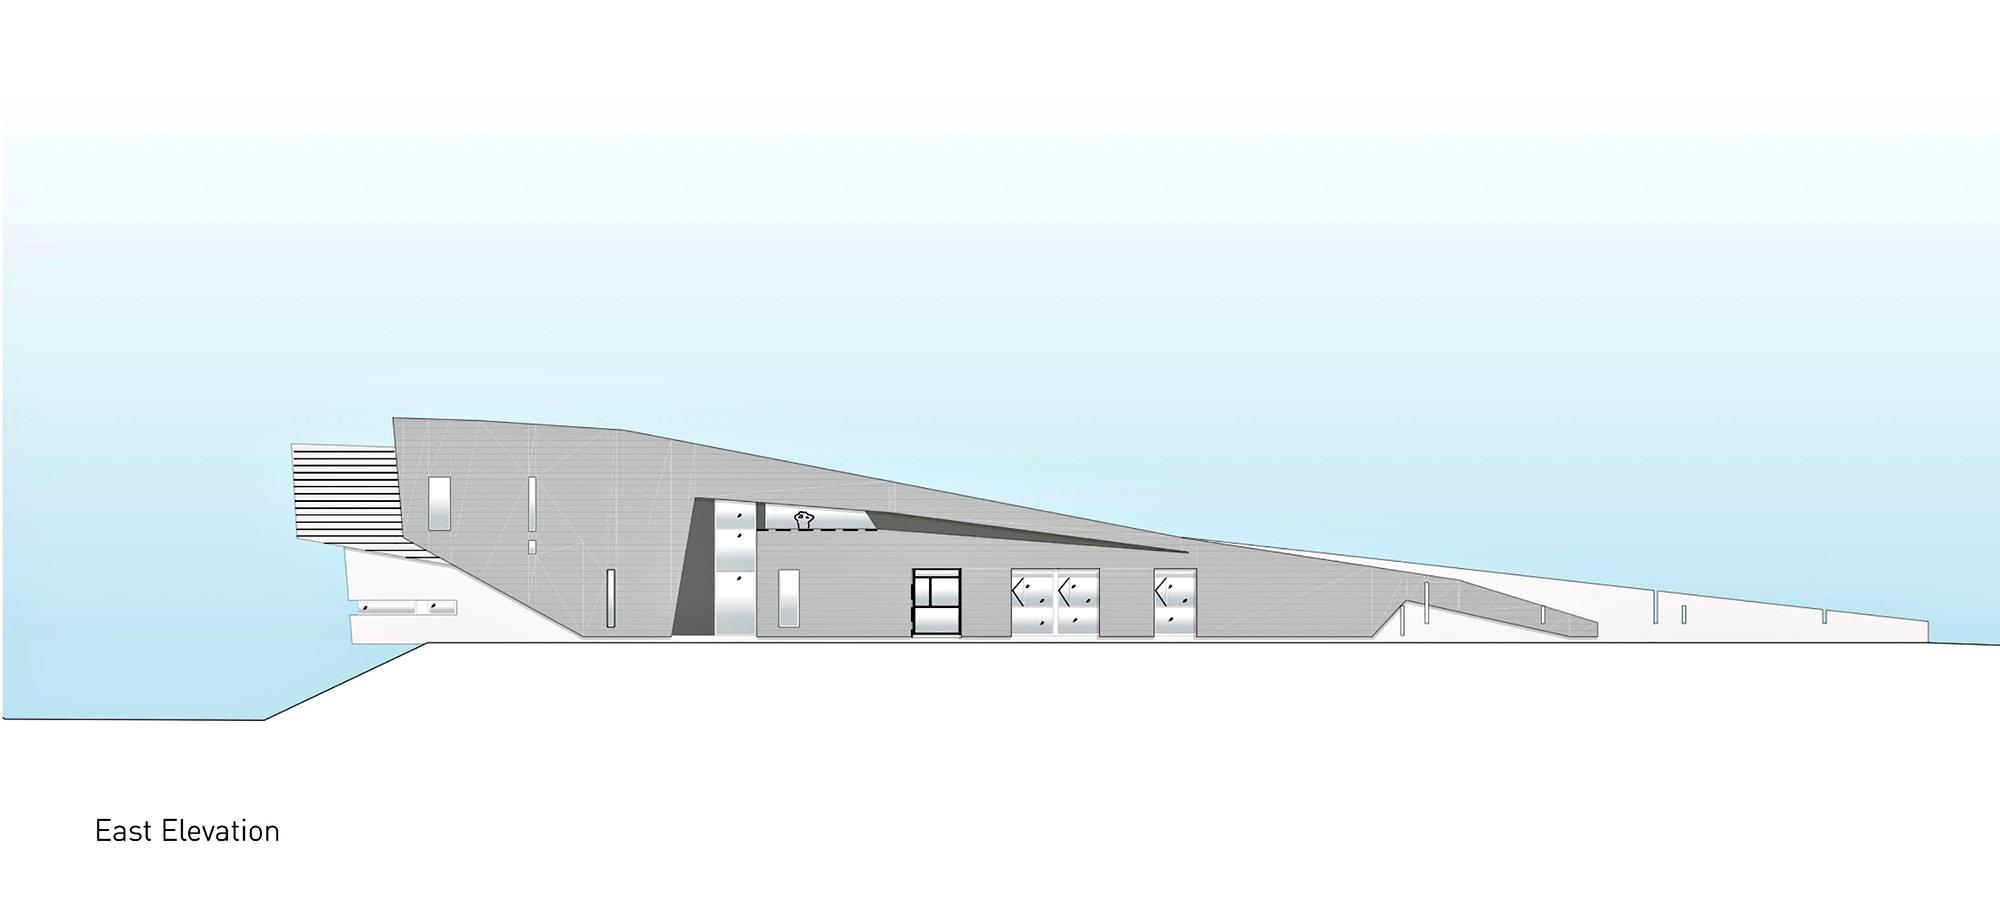 East Elevation – Port Hope Residence – Lakeshore Rd, Port Hope, ON, Canada